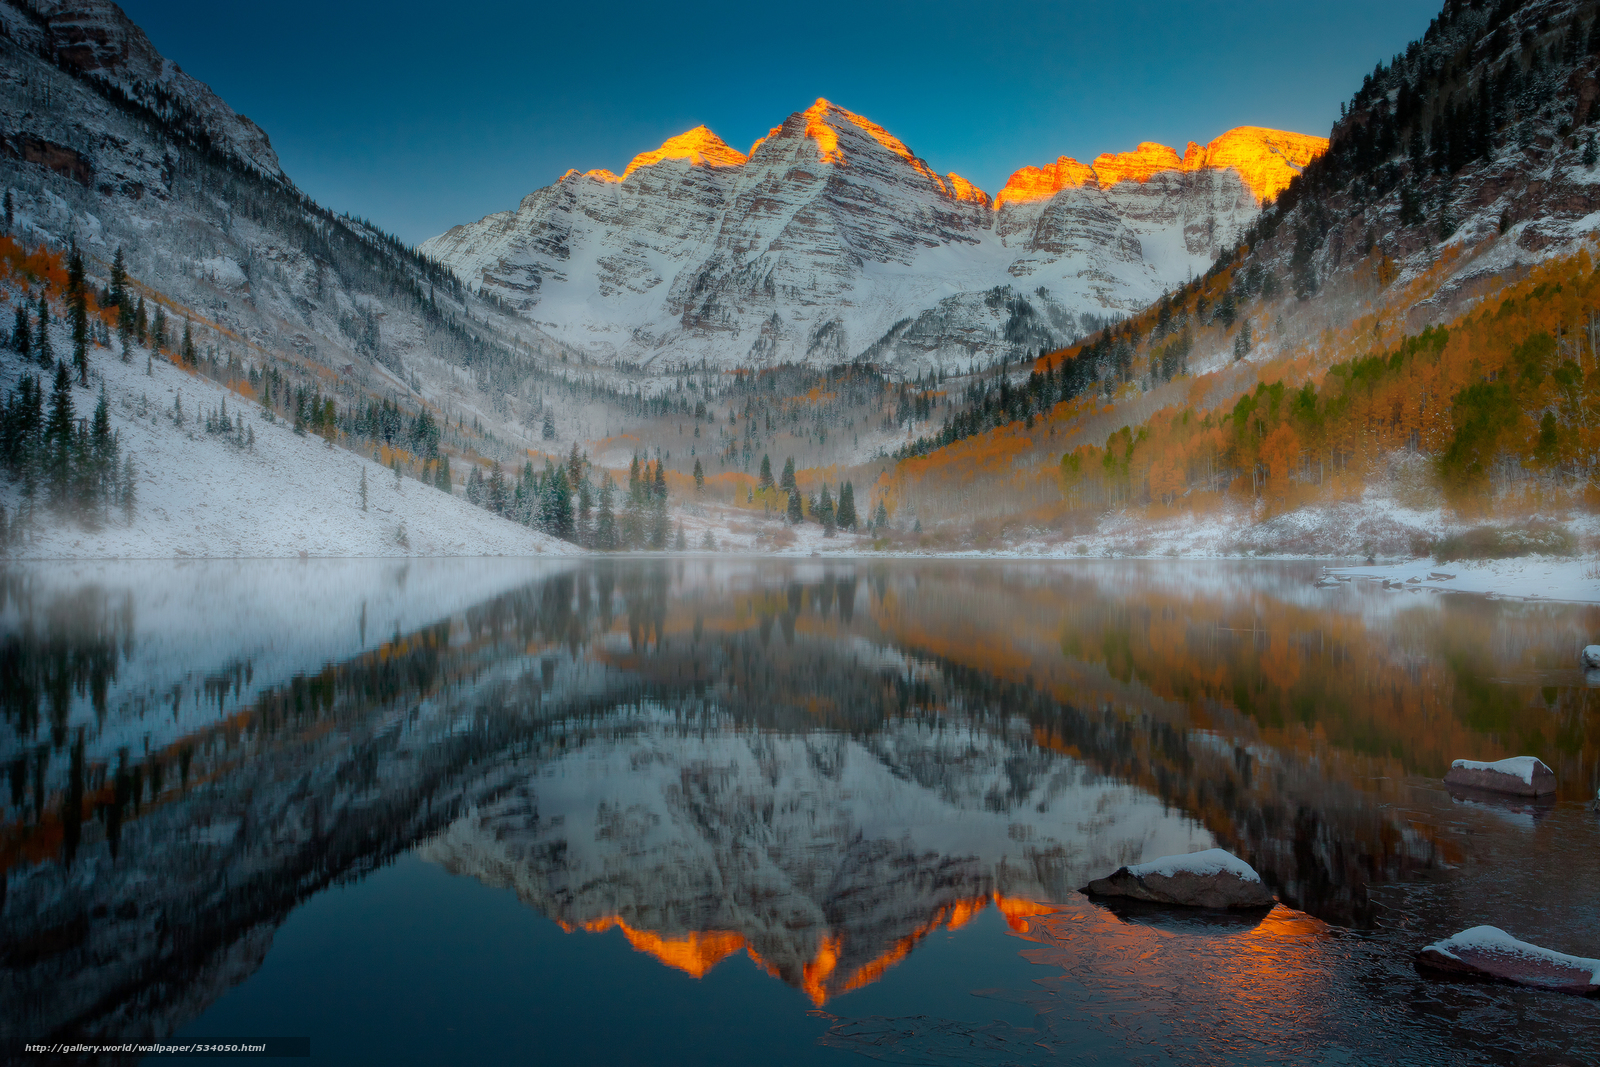 39] Aspen Colorado Desktop Wallpaper on WallpaperSafari 1600x1067